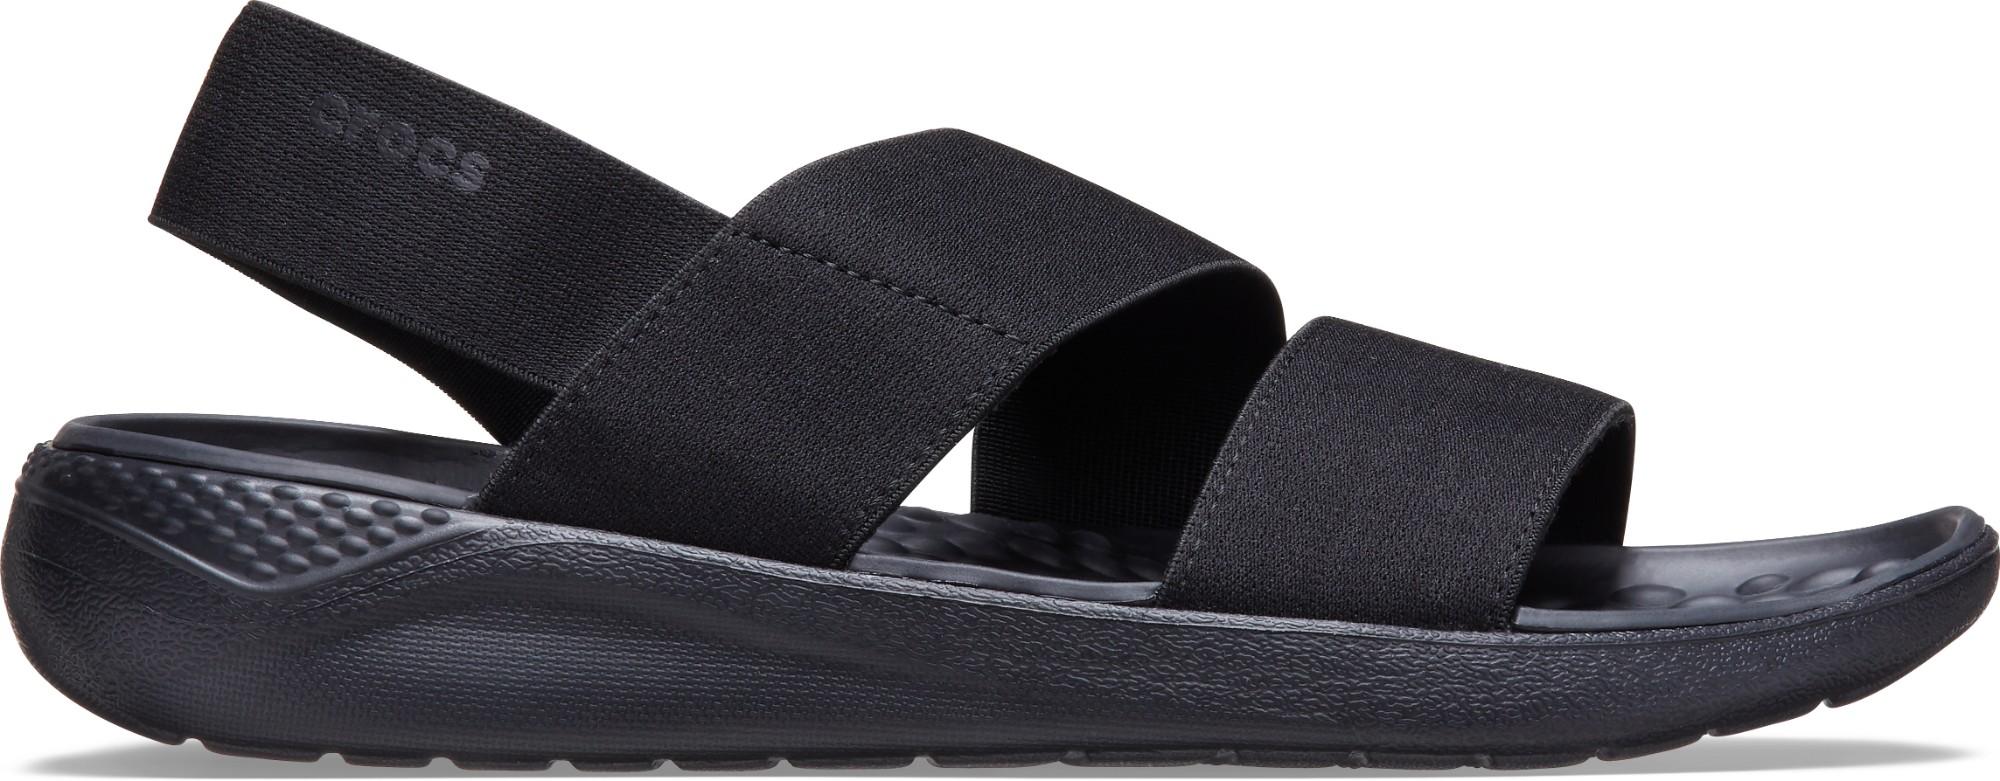 Crocs™ Literide Stretch Sandal Womens Black/Black 39,5